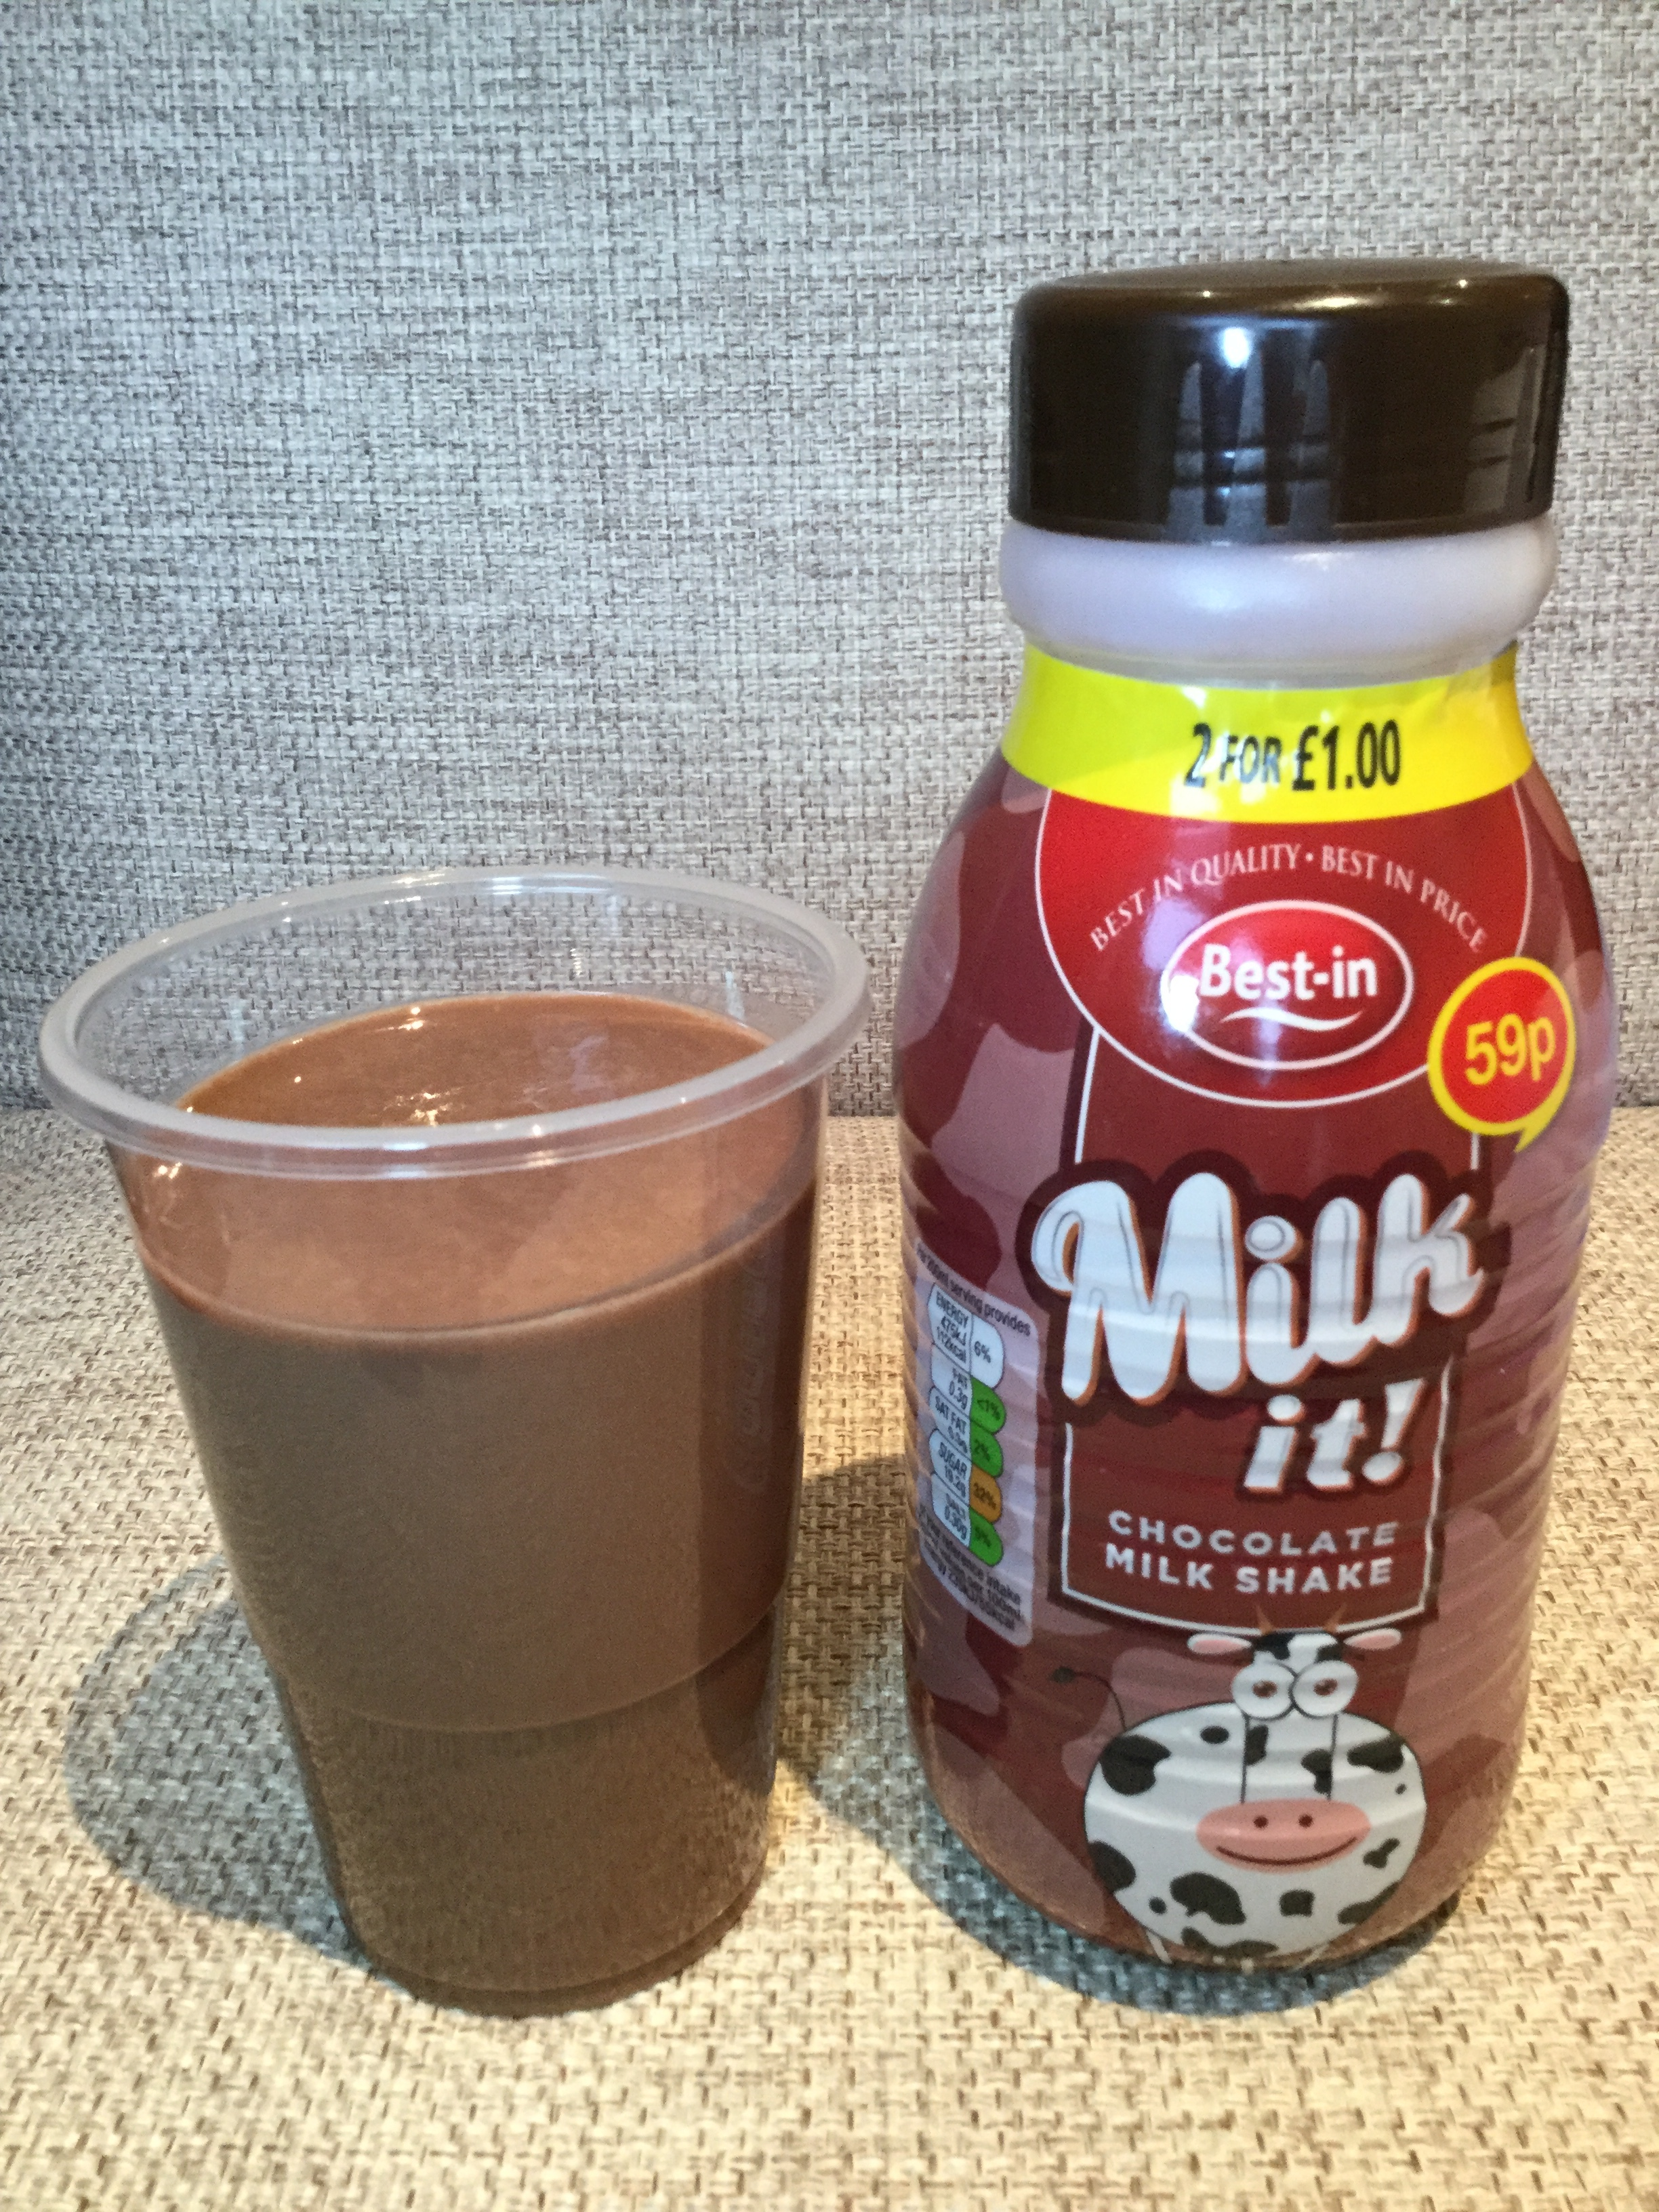 Best-in Milk It Chocolate Milk Shake Cup